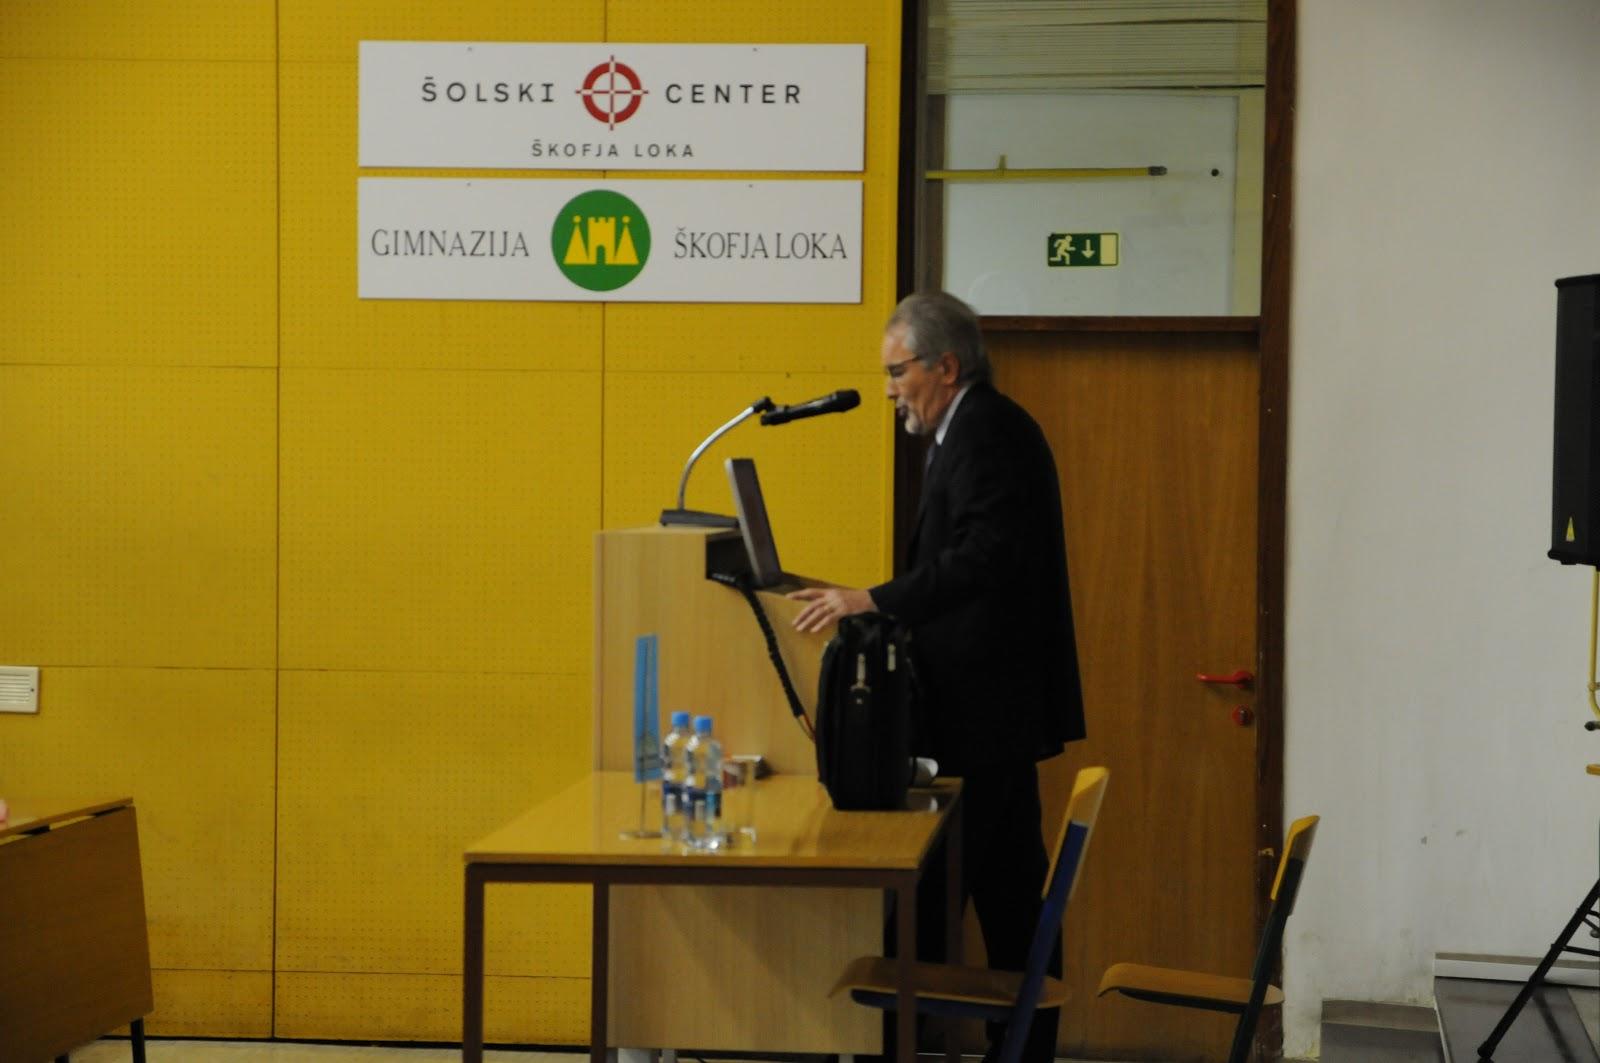 Predavanje, dr. Camlek - oktober 2011 - DSC_3876.JPG